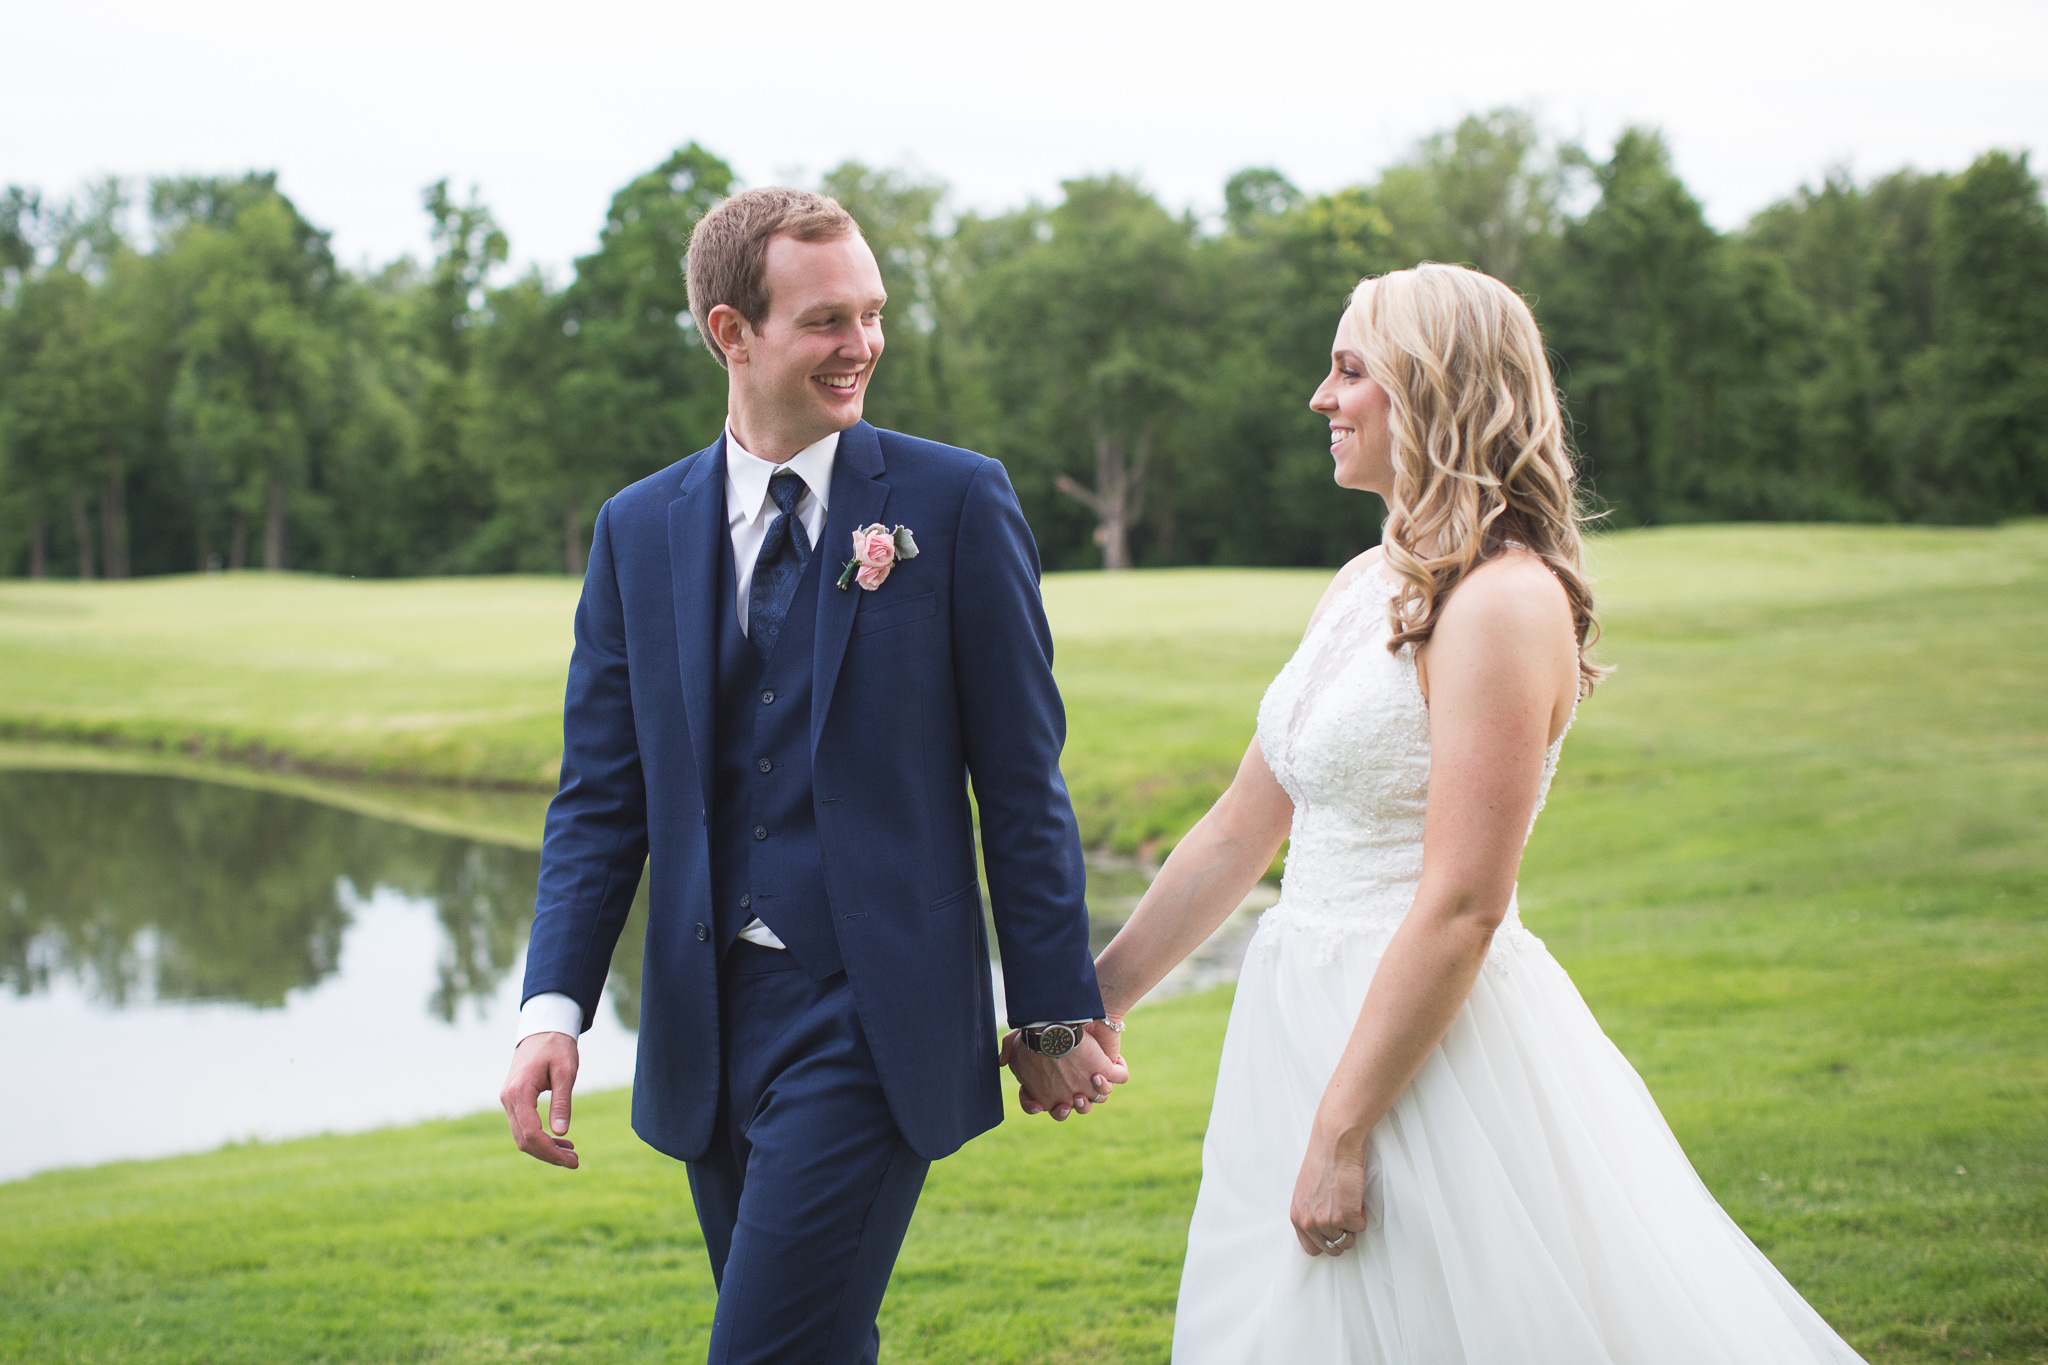 153-best-detroit-michigan-outdoor-wedding-photographer.jpg